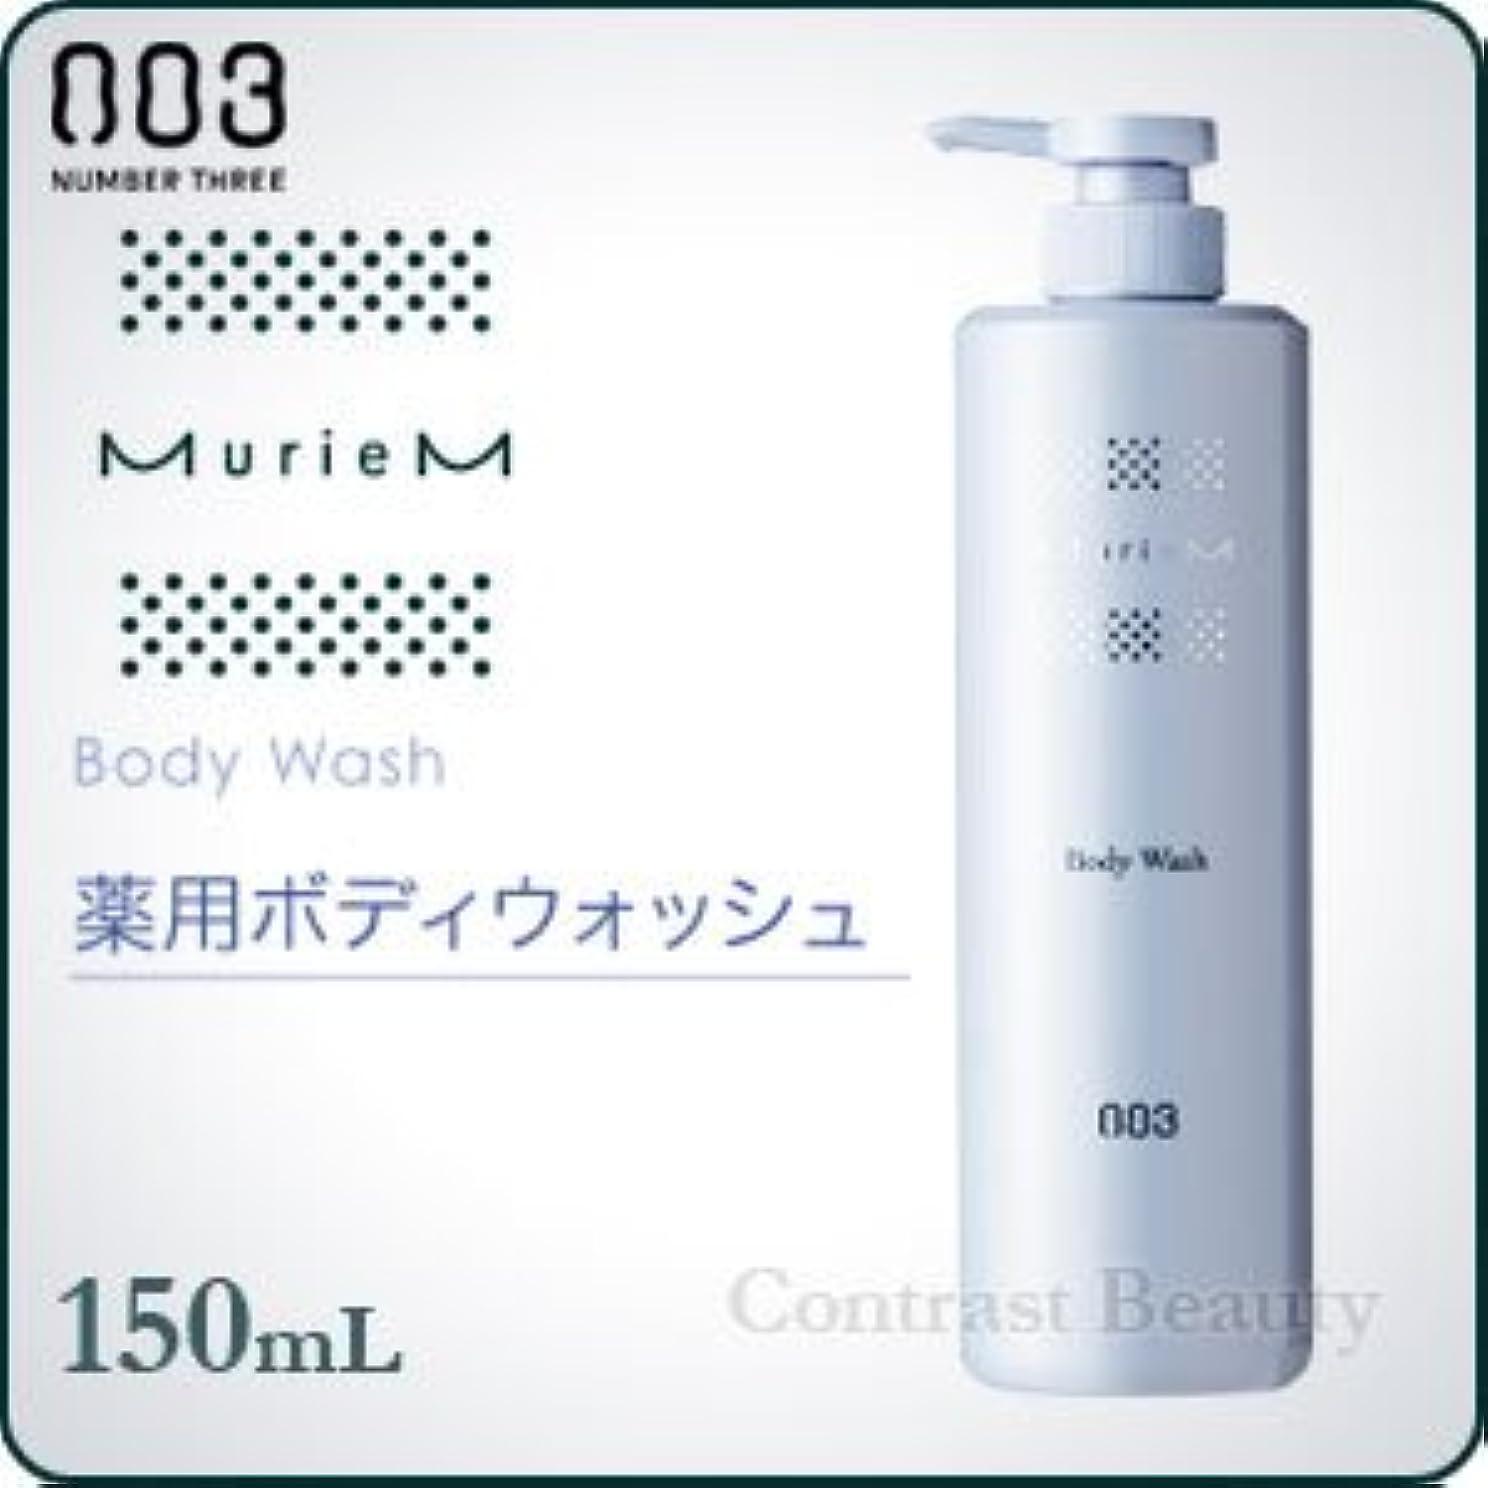 【X4個セット】 ナンバースリー ミュリアム クリスタル 薬用ボディウォッシュ 600ml 医薬部外品